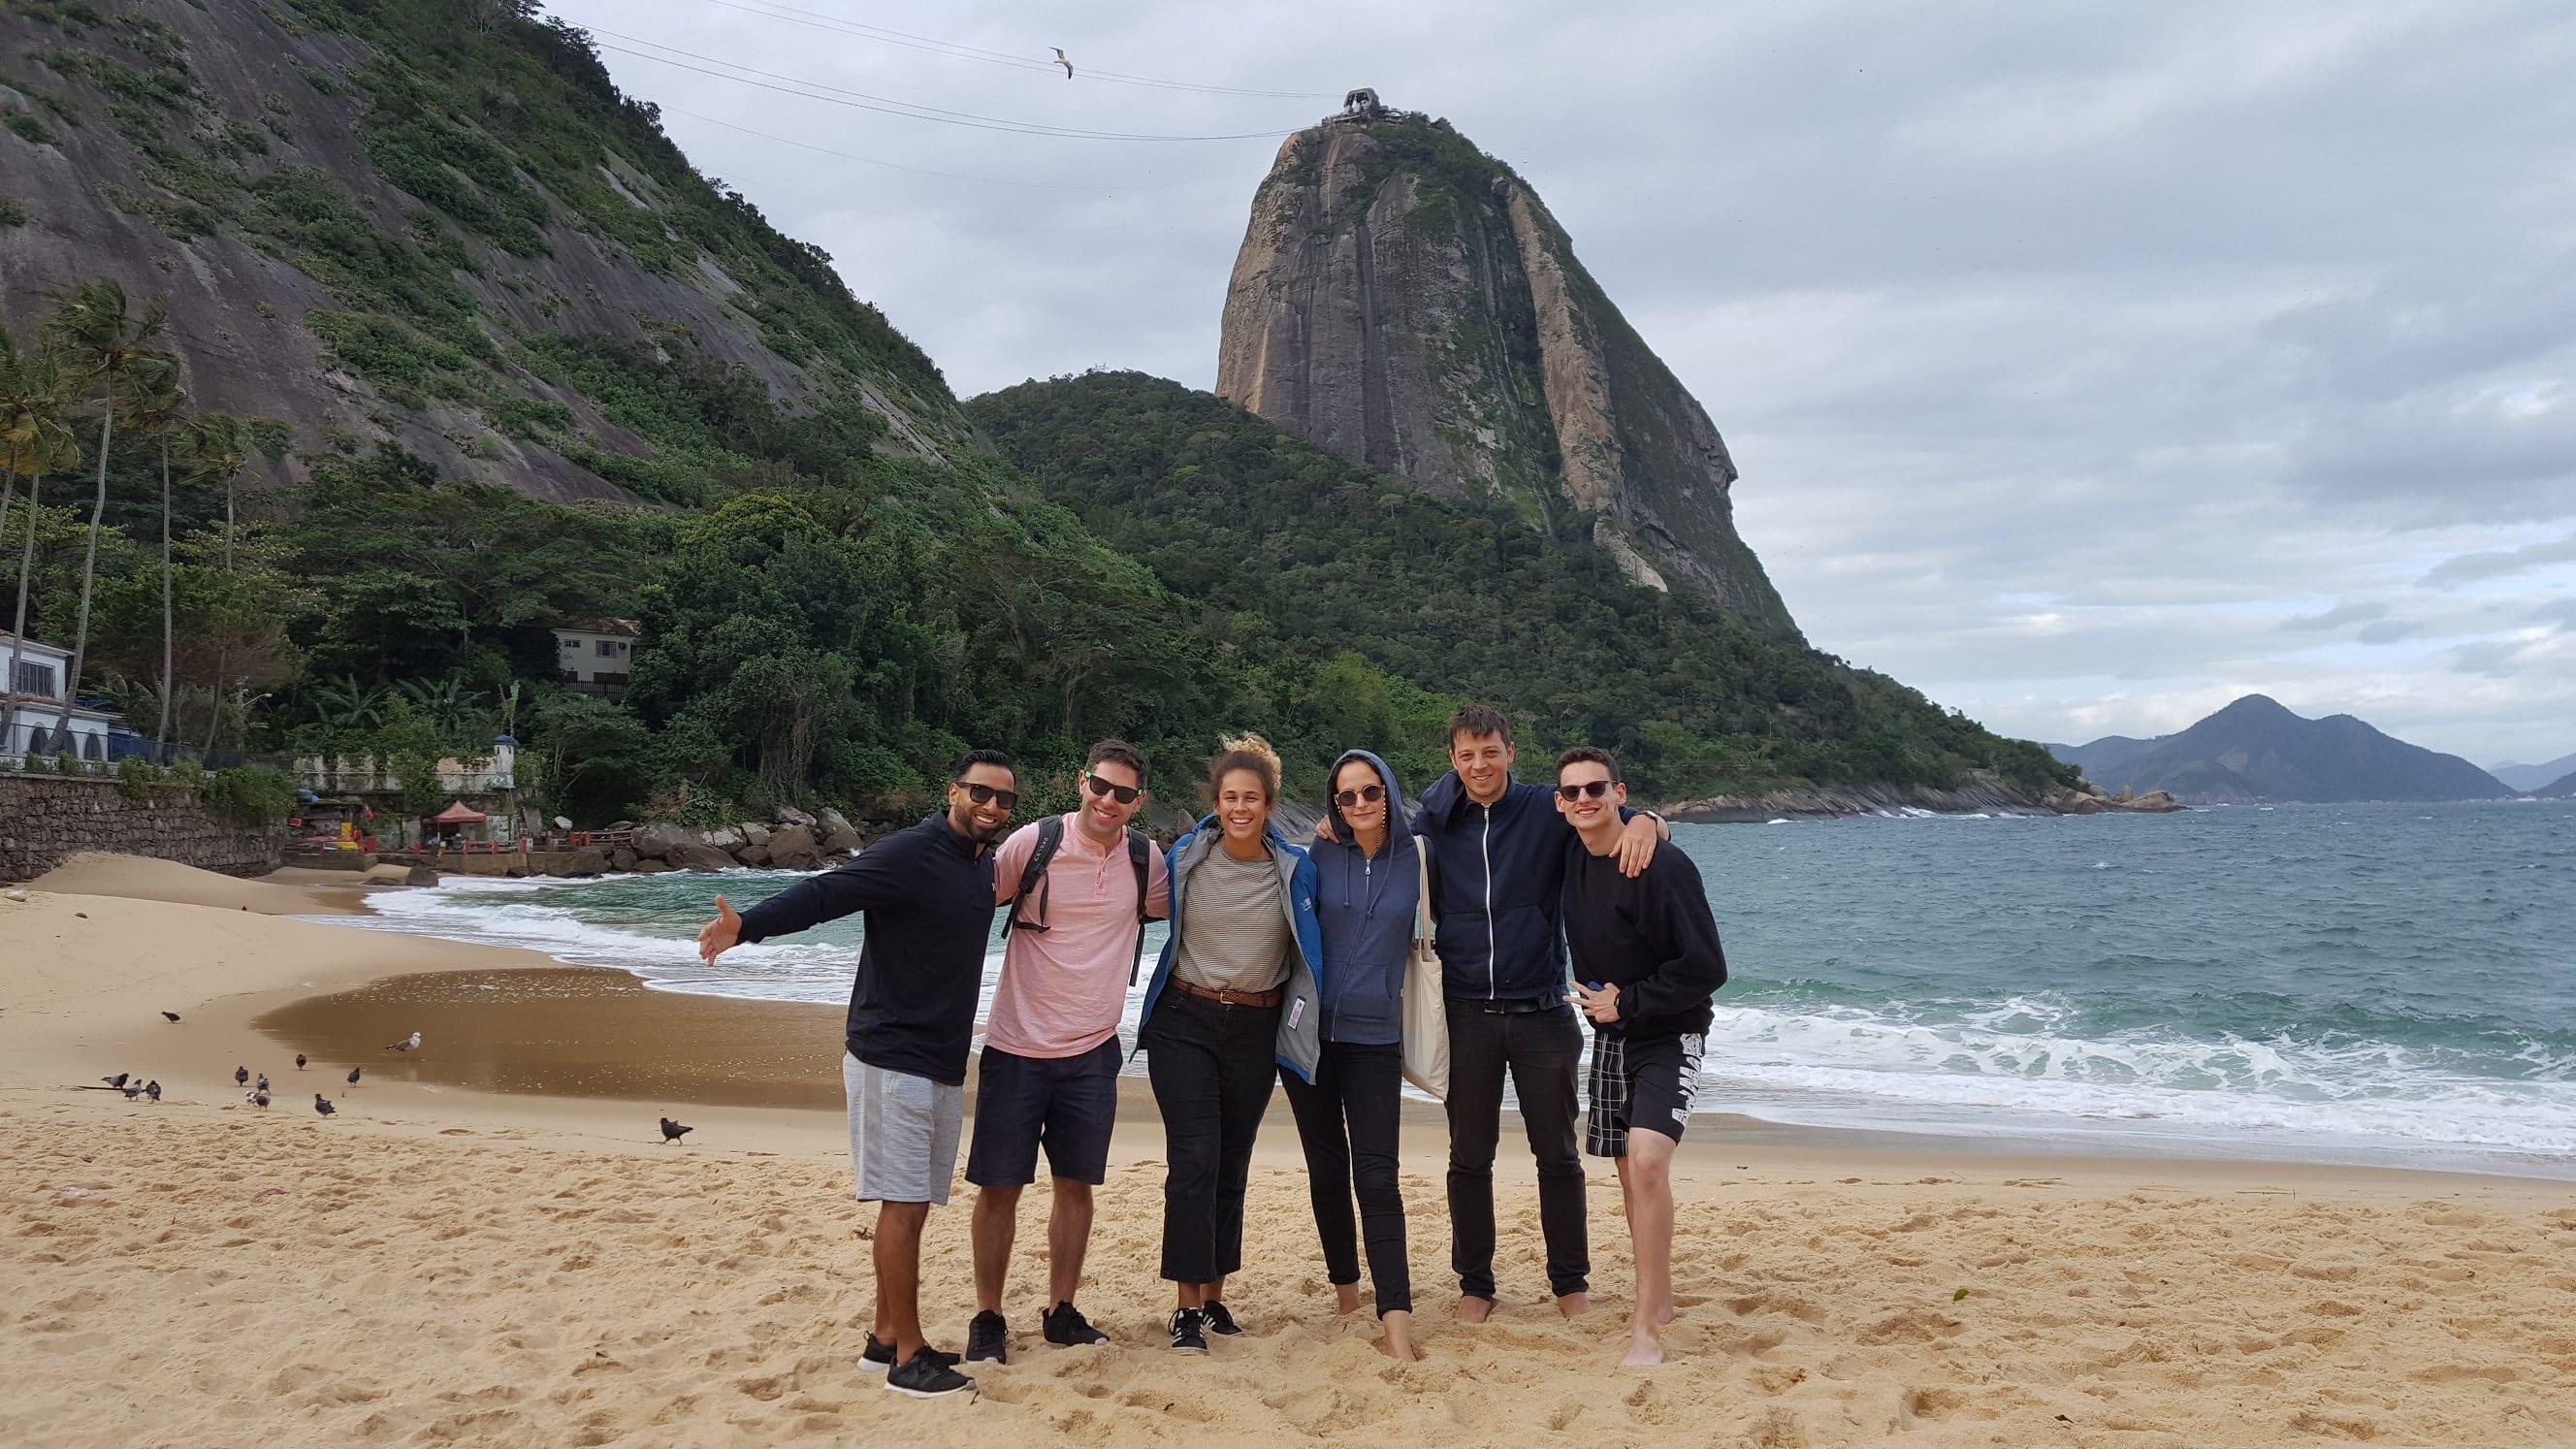 A bit cold, yet beautiful Praia Vermelha. View of the Sugar loaf from Praia Vermelha in Rio de Janeiro.